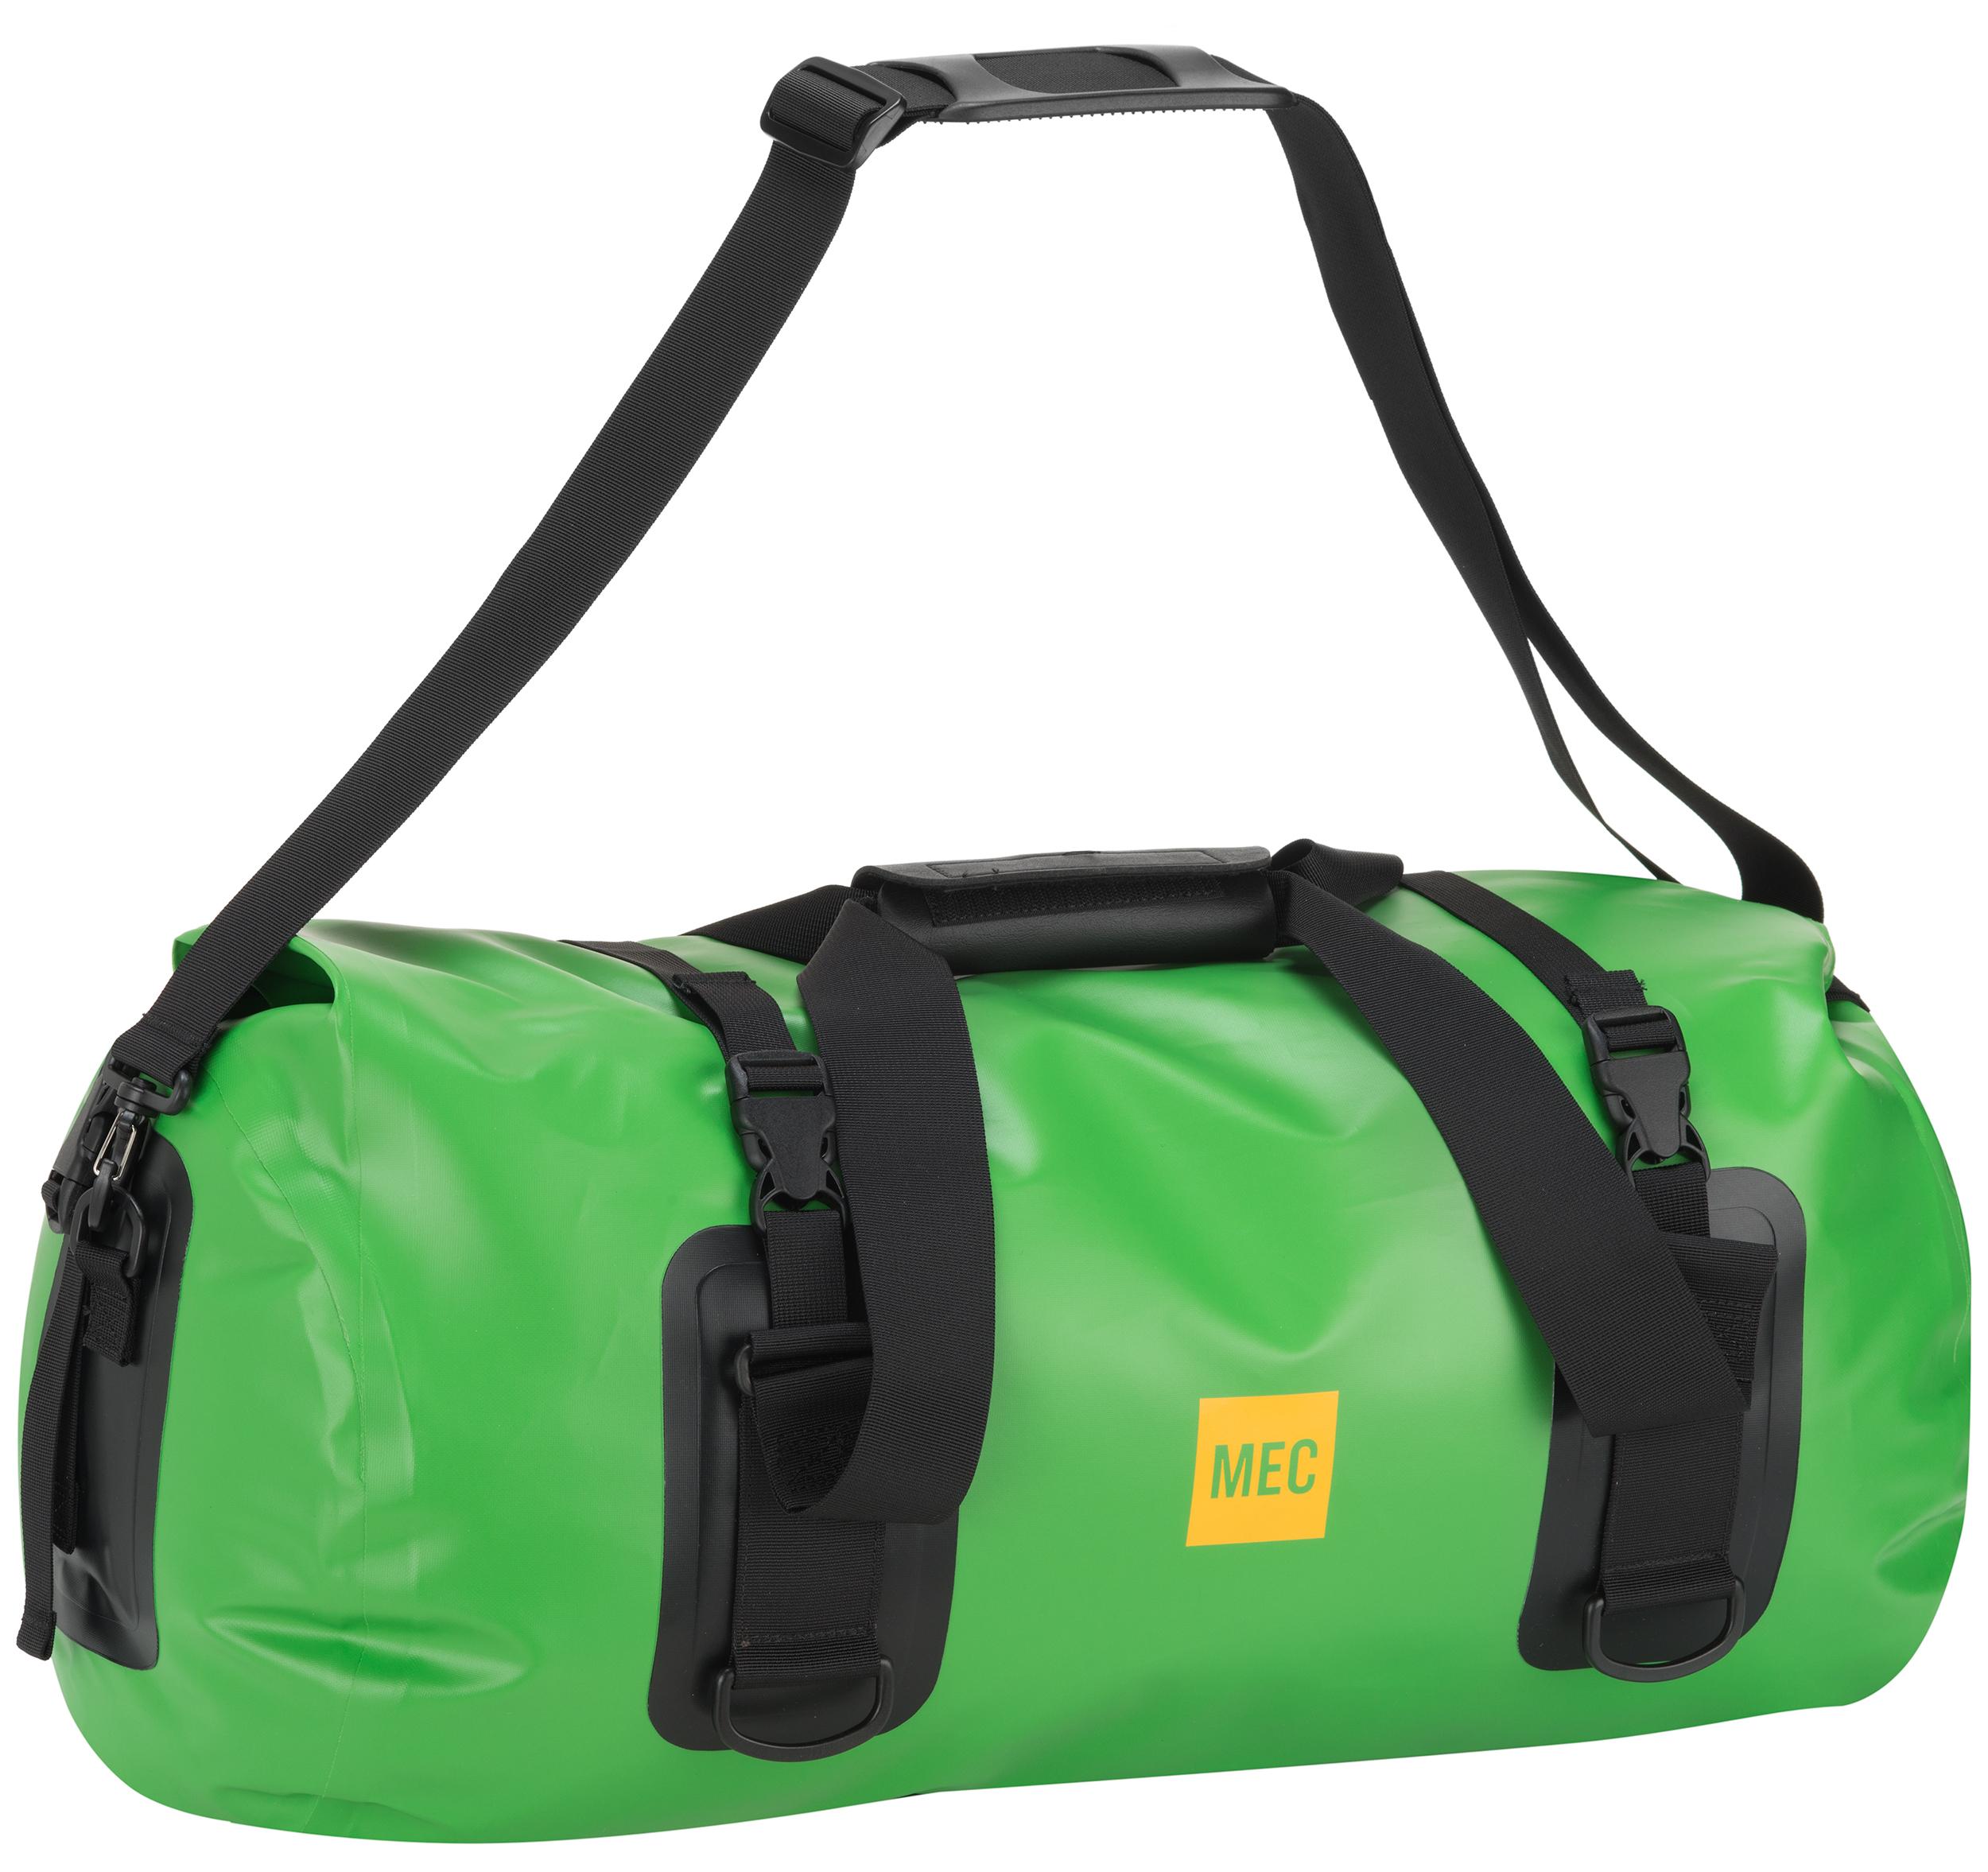 MEC Candem Dry Duffle Bag